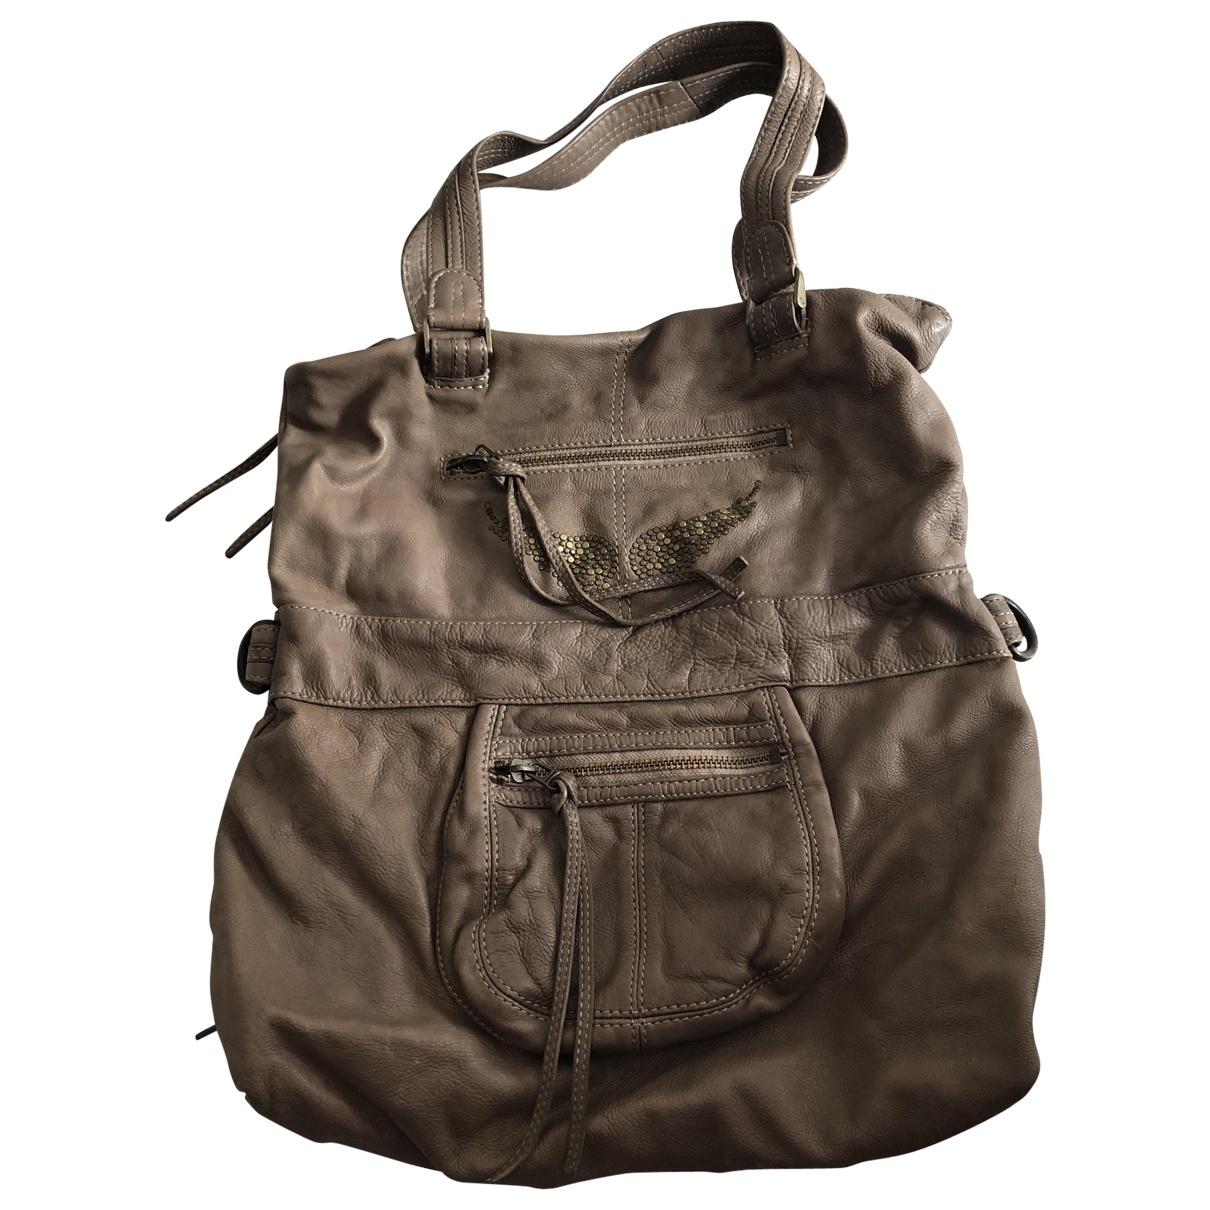 Zadig & Voltaire \N Camel Leather handbag for Women \N